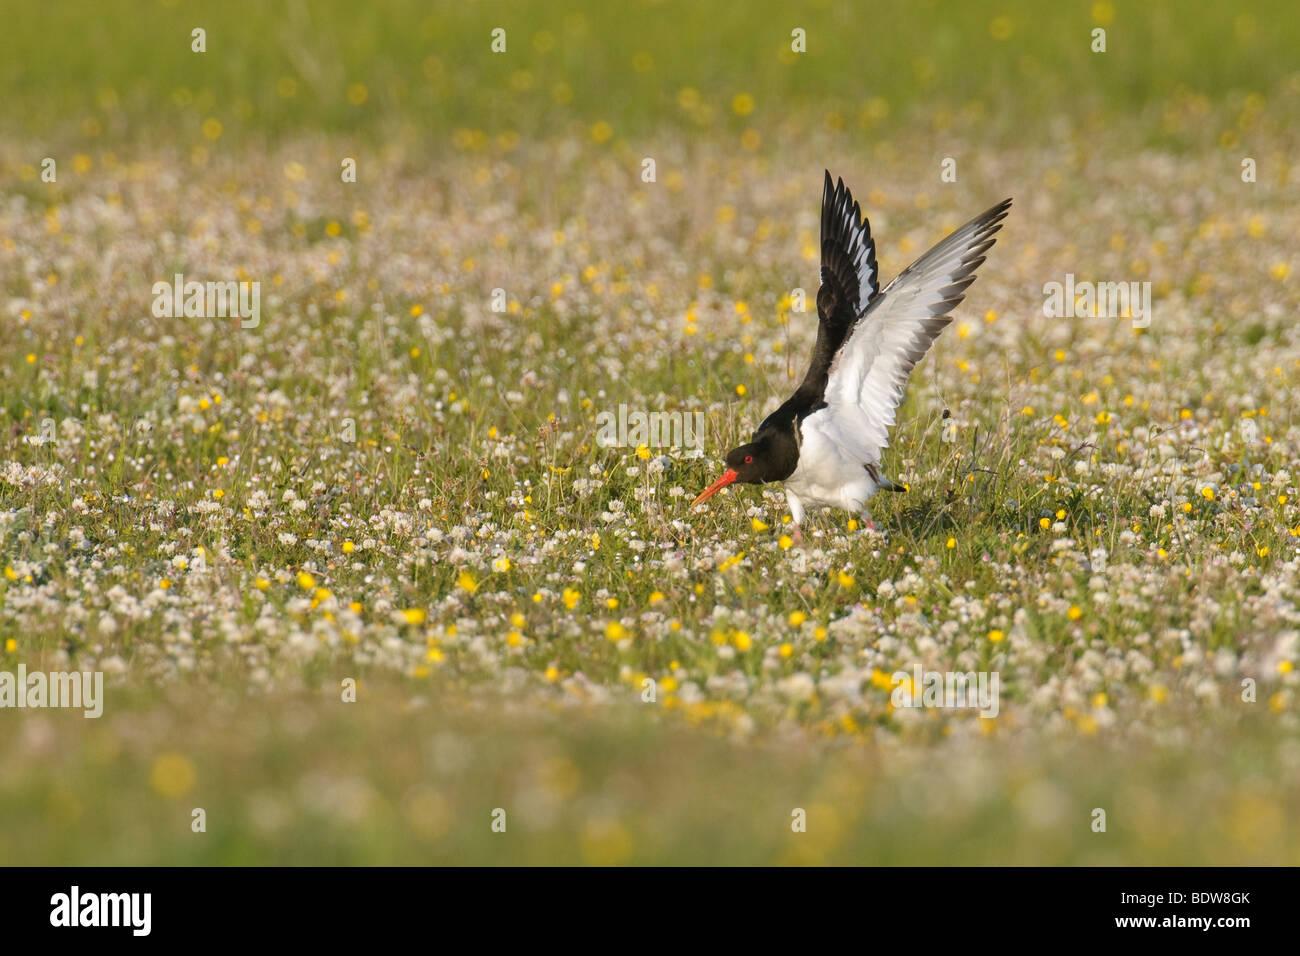 Oystercatcher Haematopus ostralegus in machair. Island of South Uist, Scotland. - Stock Image